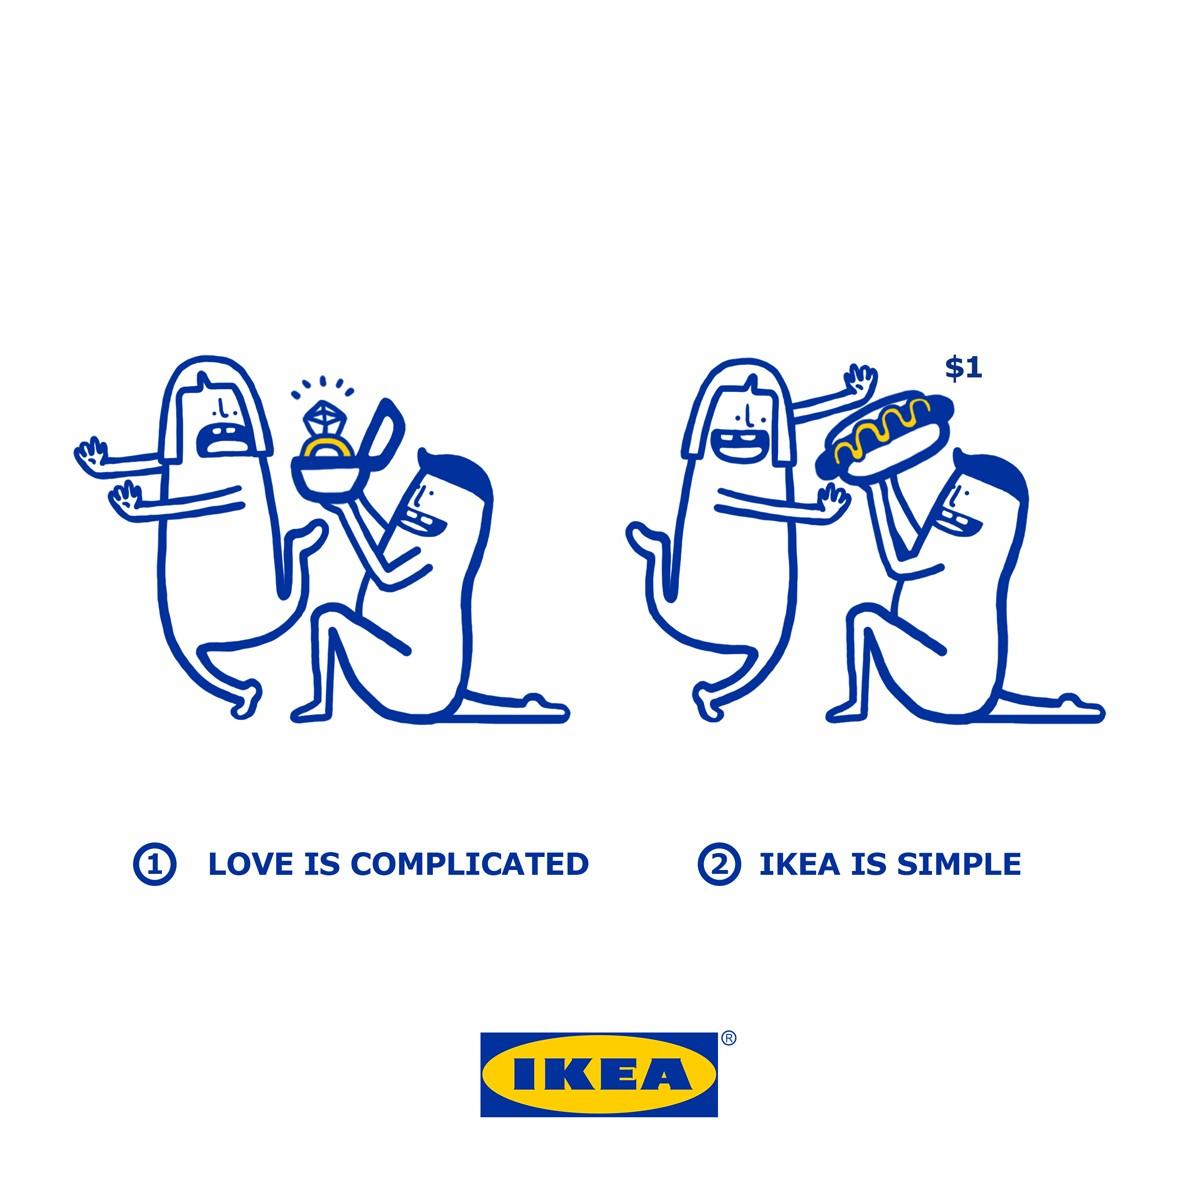 Ikea Singapore's cute Valentine's Facebook campaign